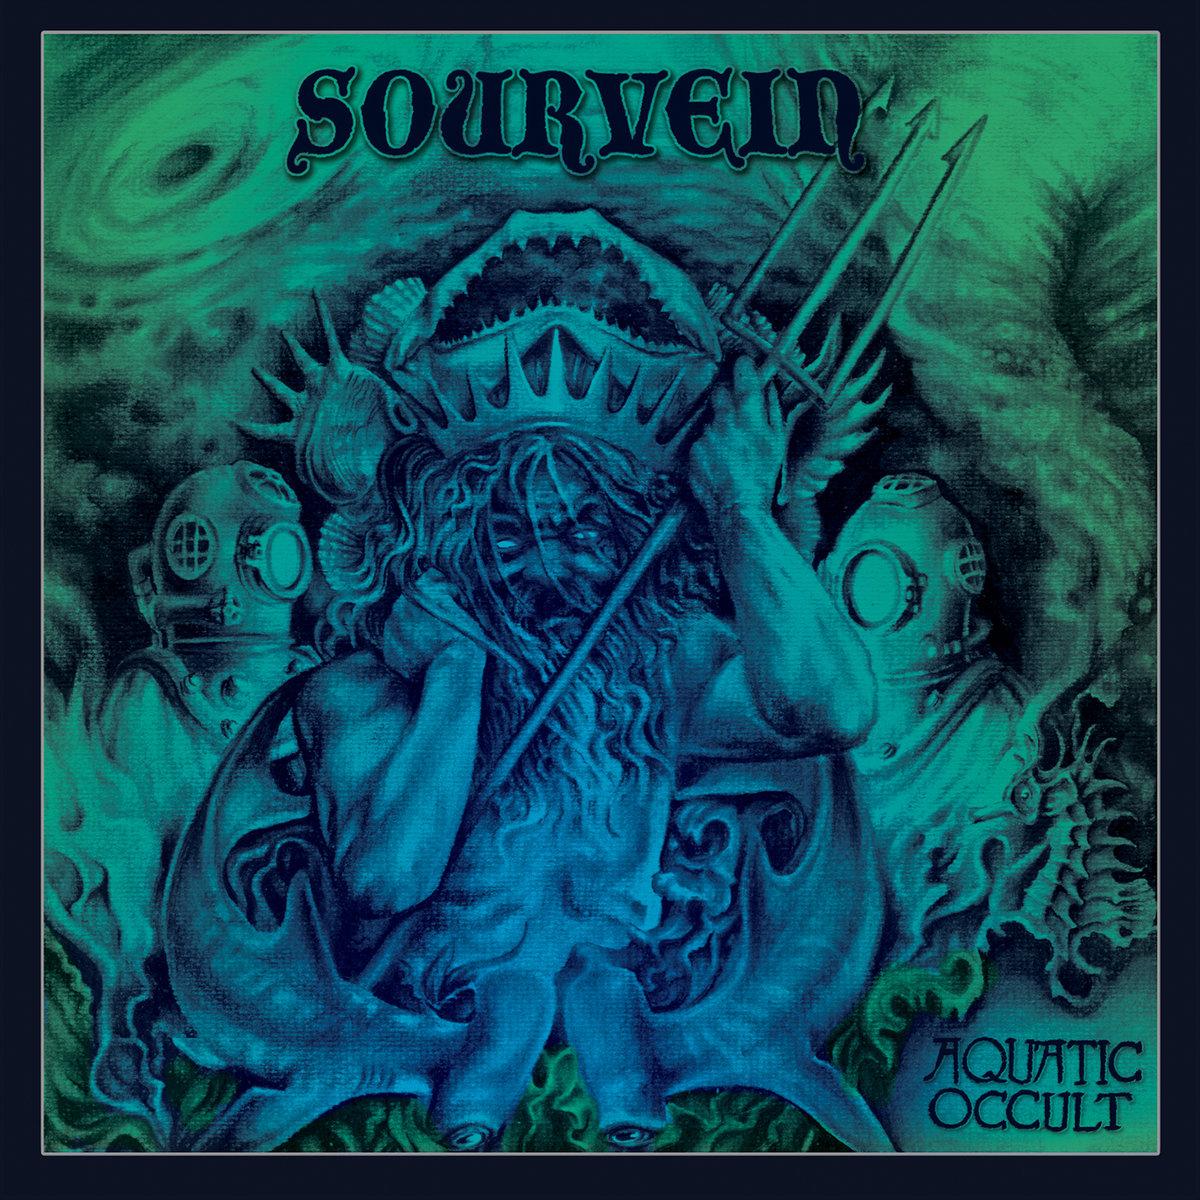 sourvein-aquatic-occult.jpg